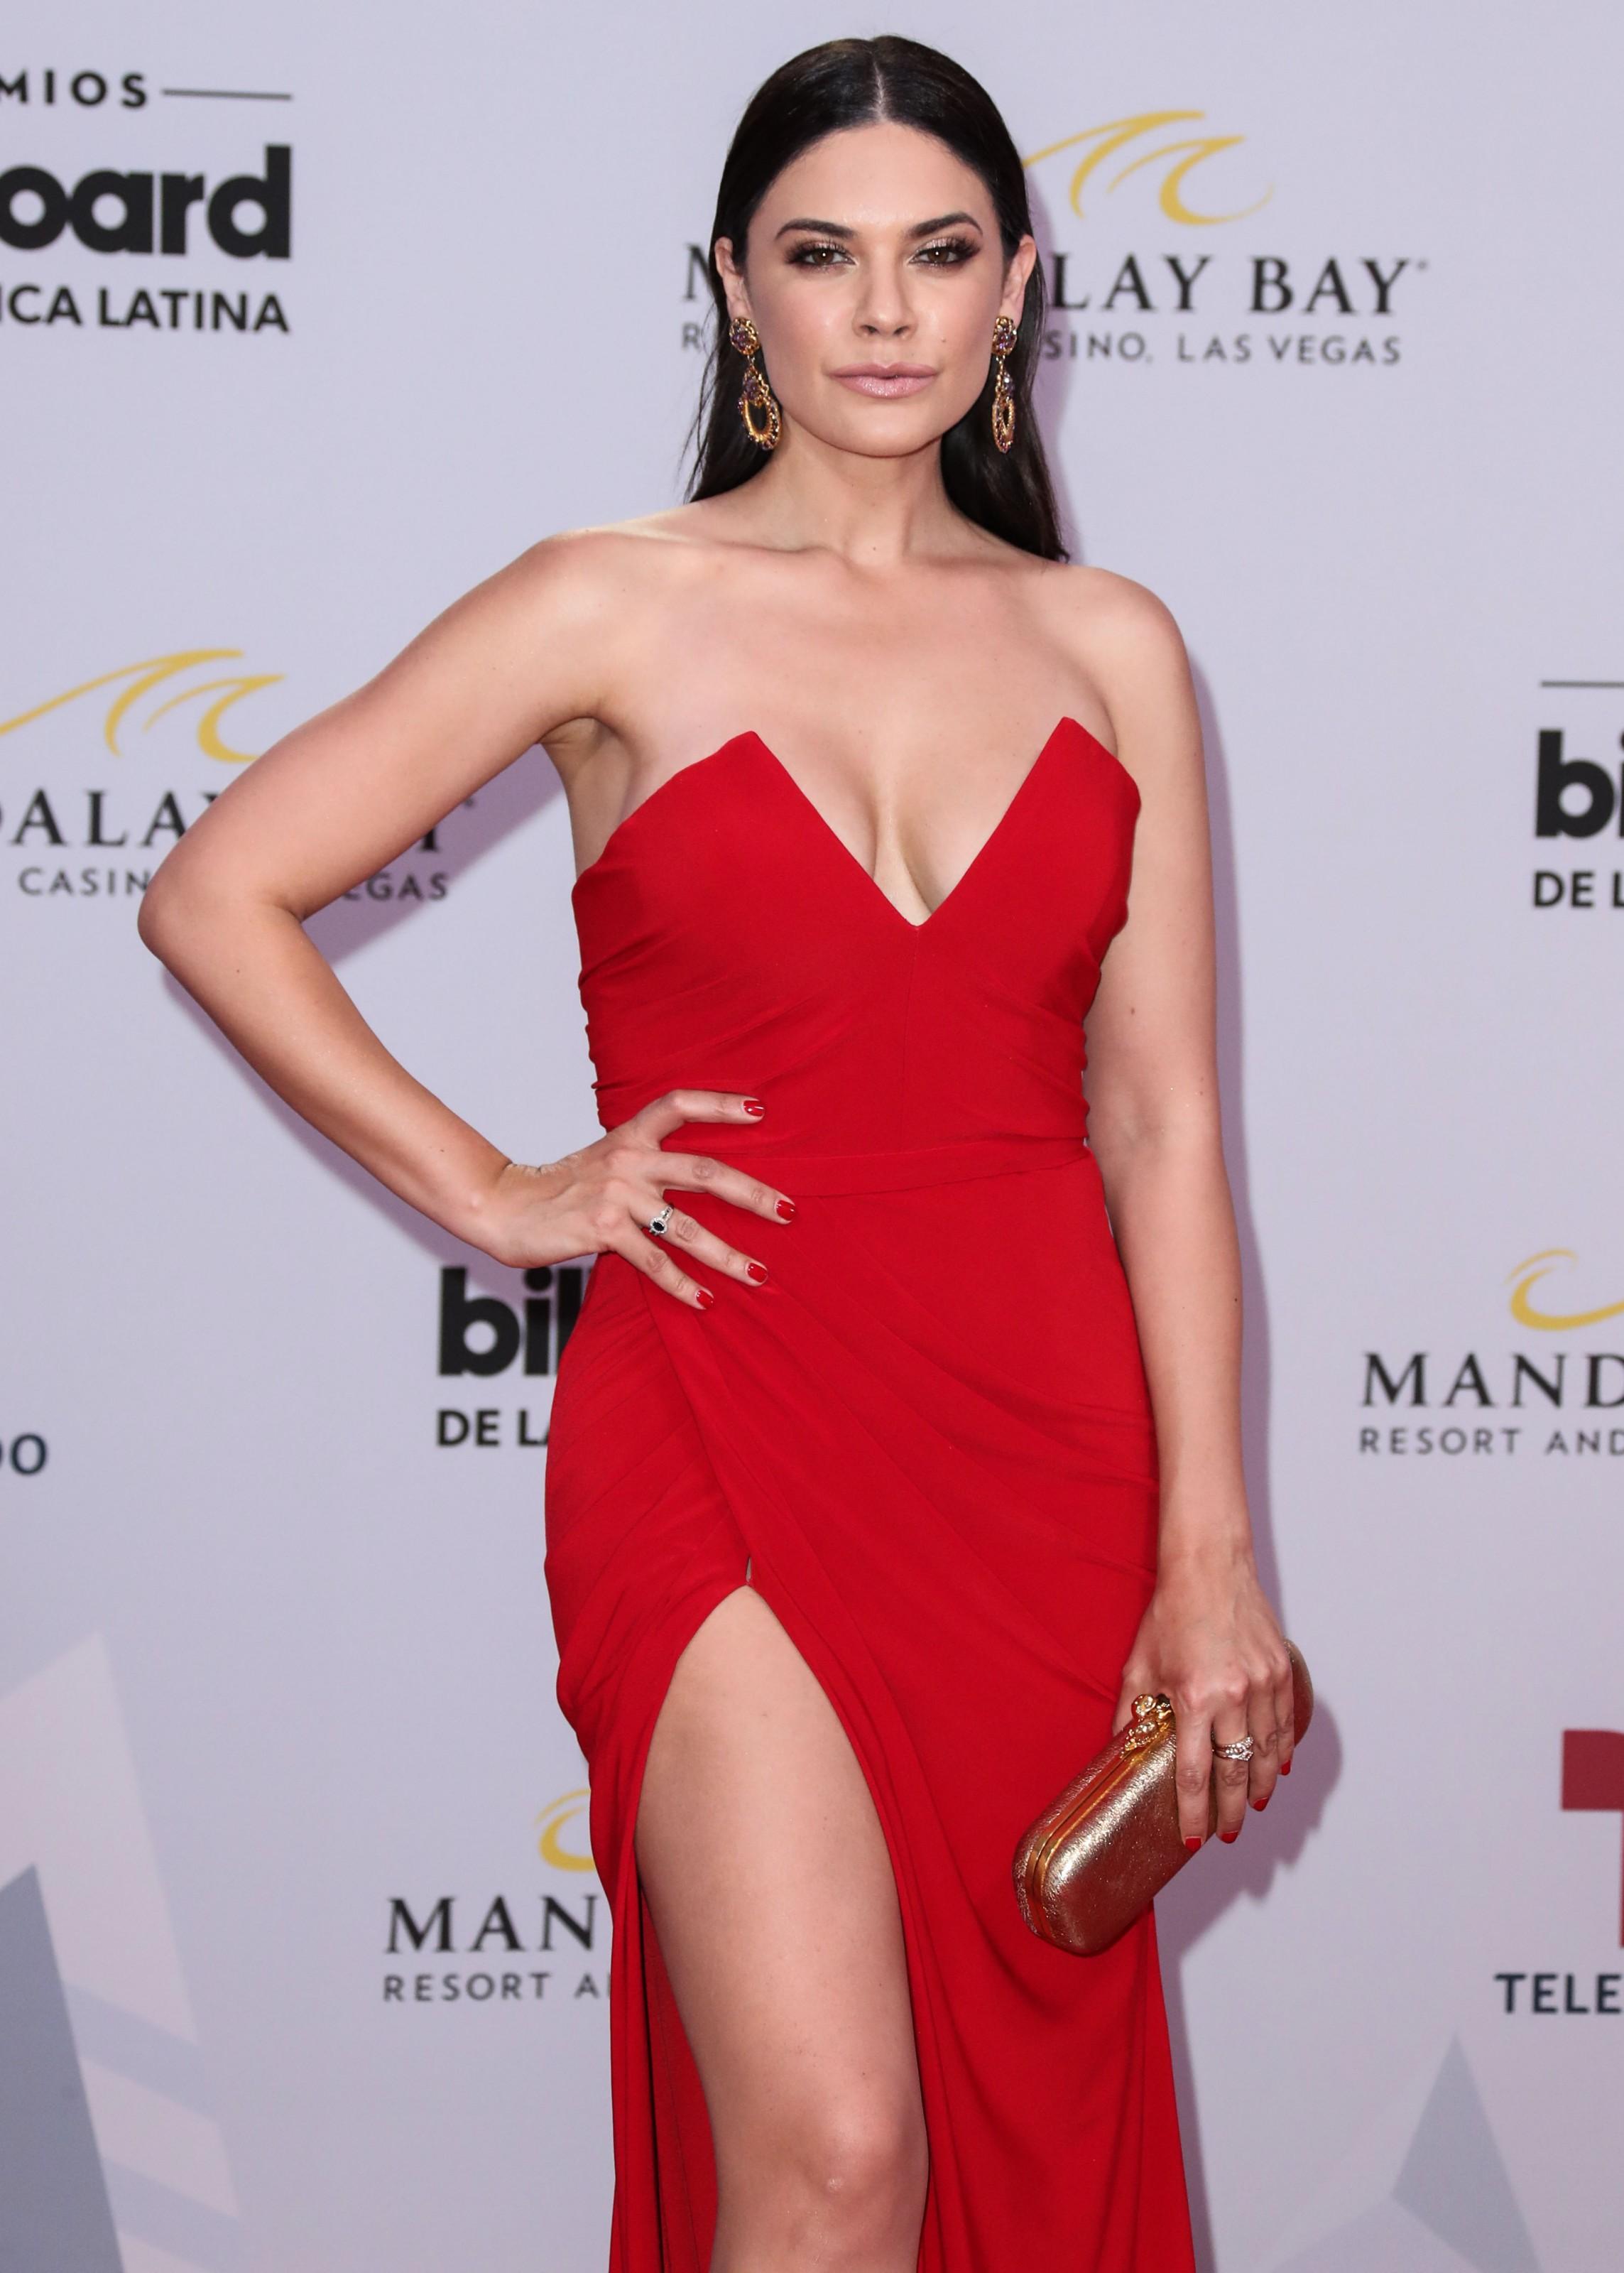 Angelica Celaya (Xavier Collin/Image Press Agency / MEGA)